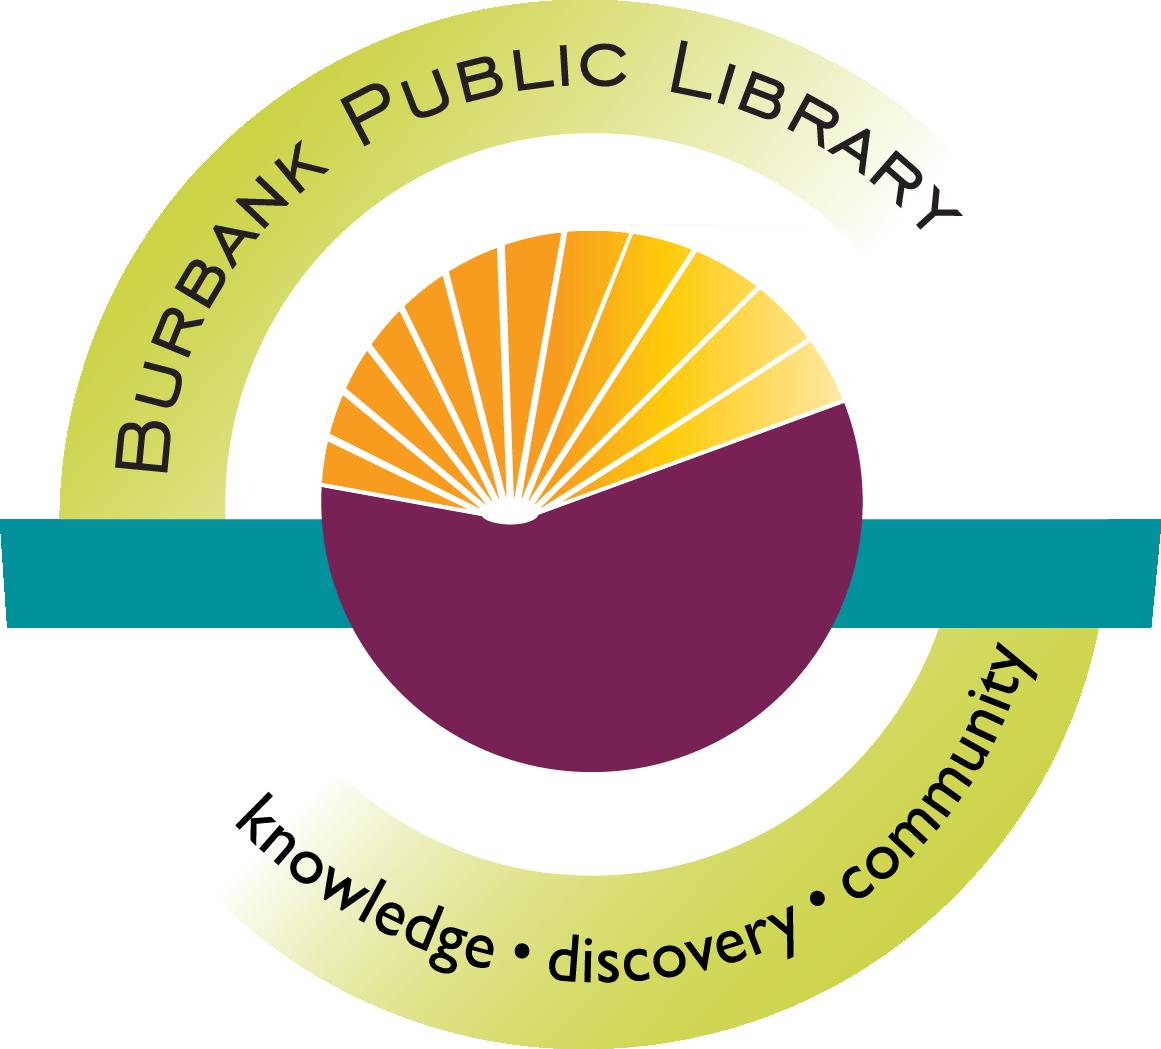 Burbank Public Library logo